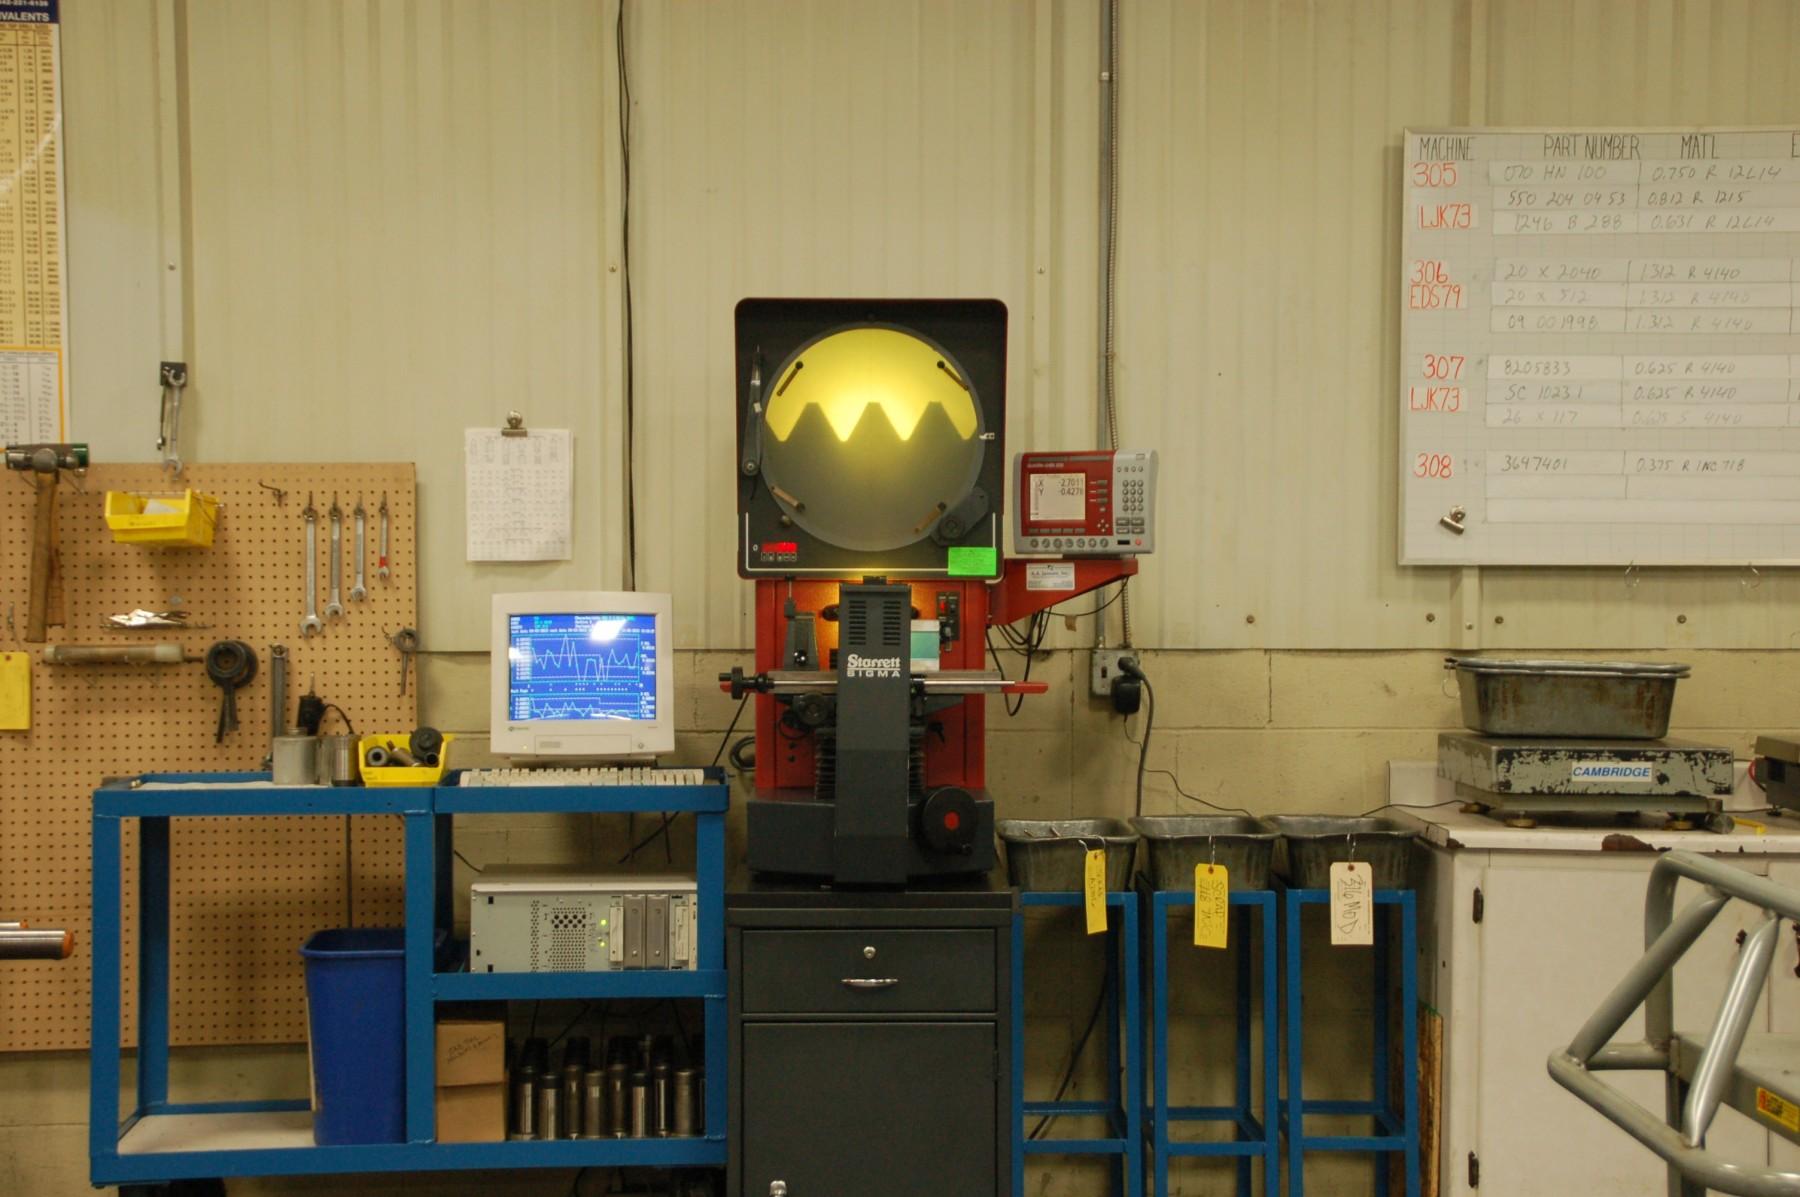 Huron Automatic Screw Company Supports Automotive Innovation